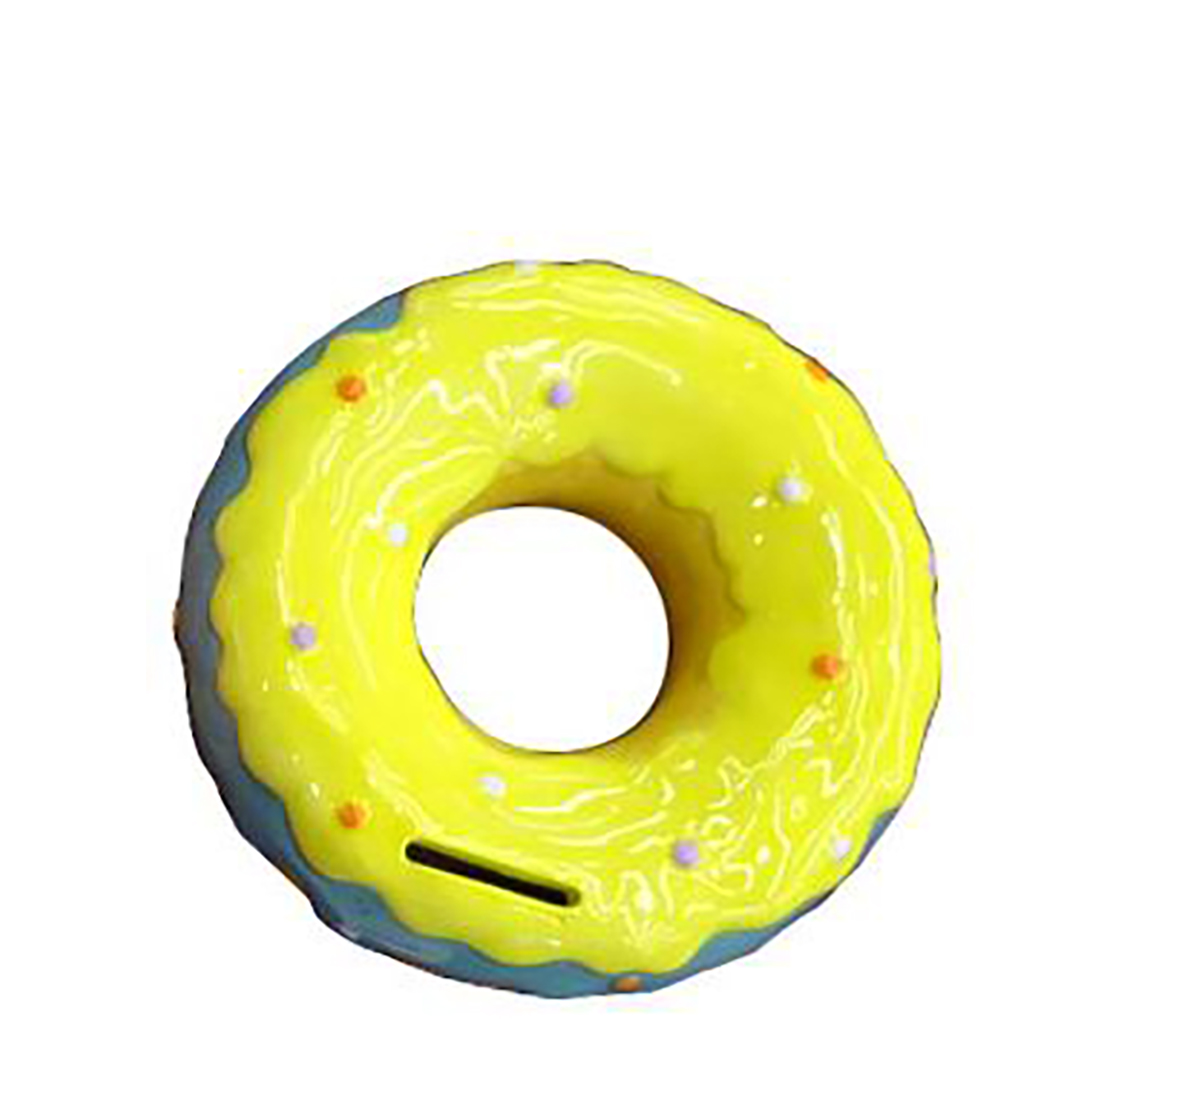 Karma | Karma Money Bank In Yellow Colour Impulse Toys for Kids age 3Y+ (Yellow)